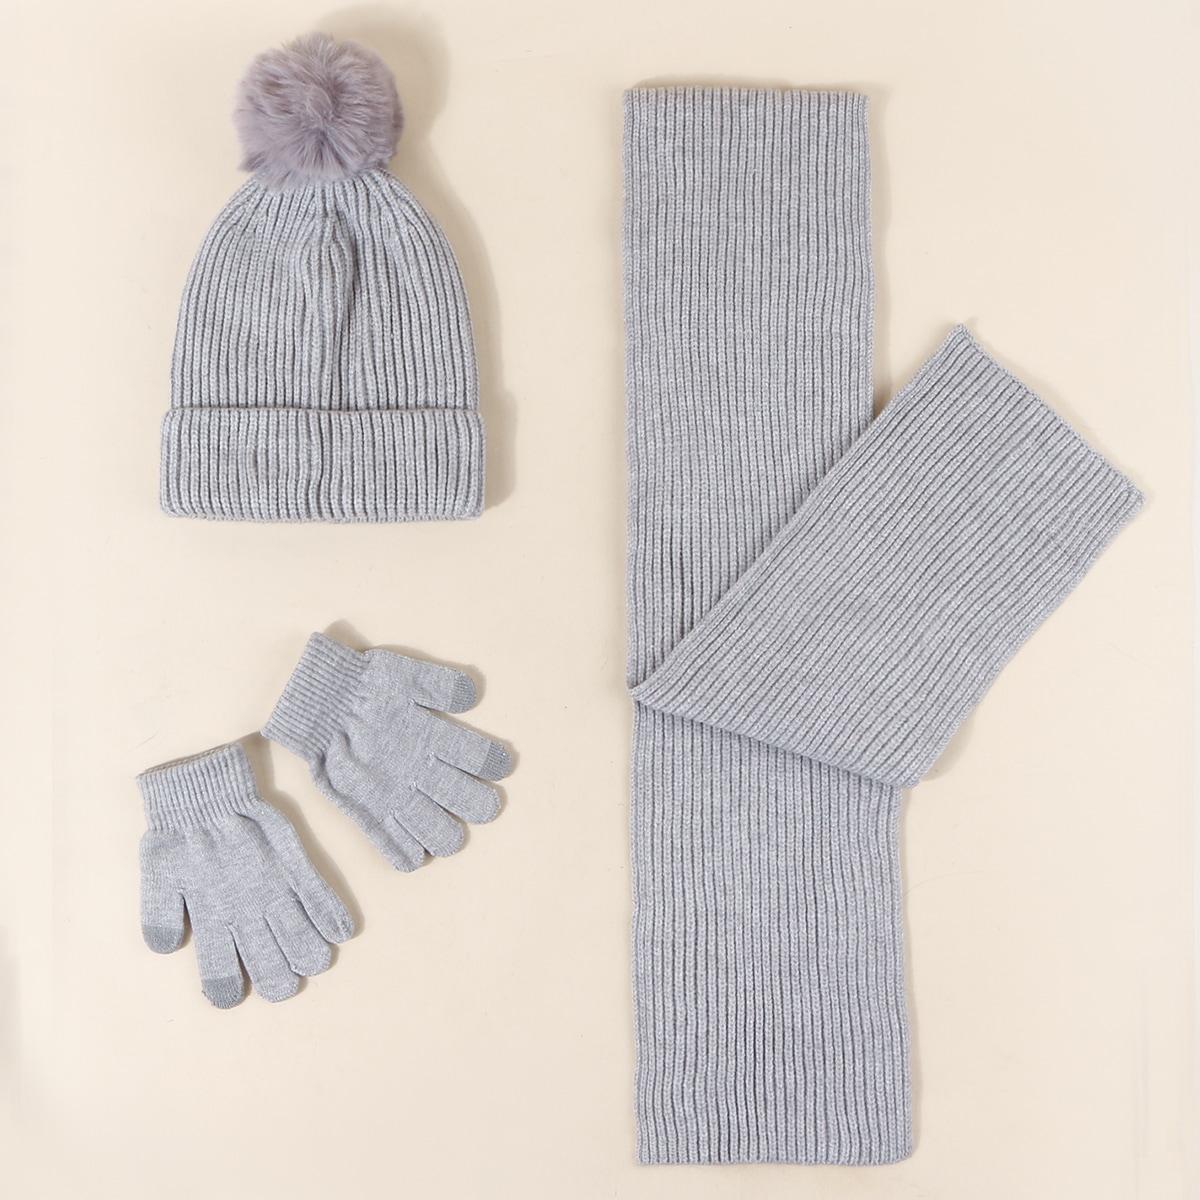 1 Stück Kleinkind Mütze & 1 Paar Handschuhe & 1 Stück Schal